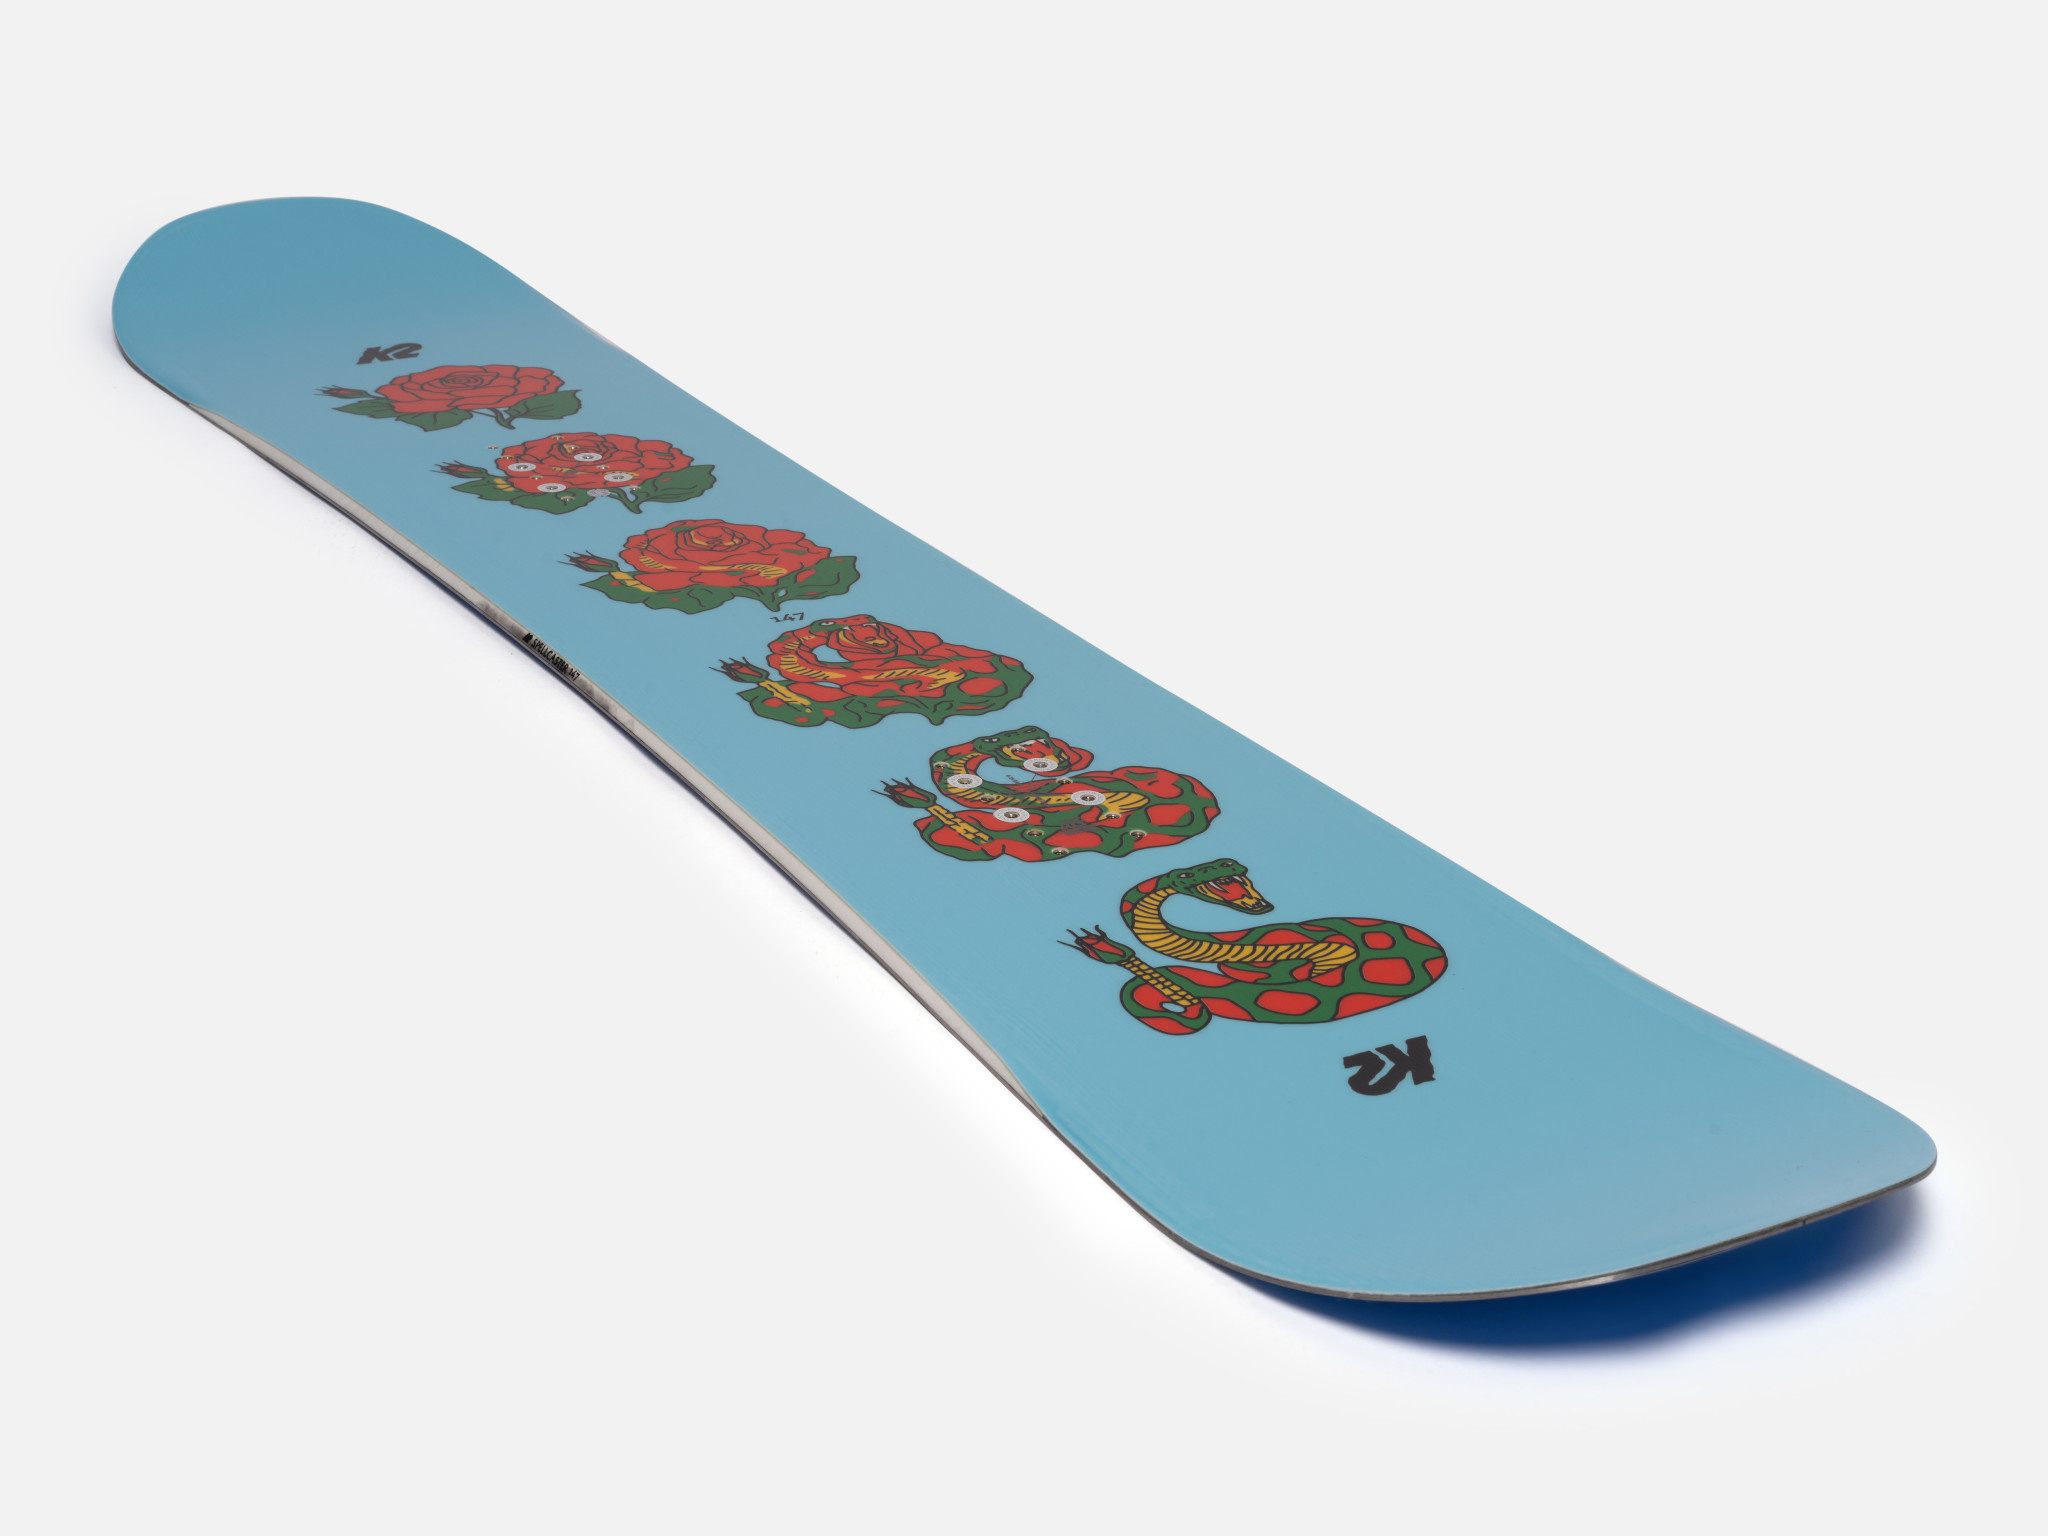 K2 Snowboard K2 W's Spellcaster Snowboard